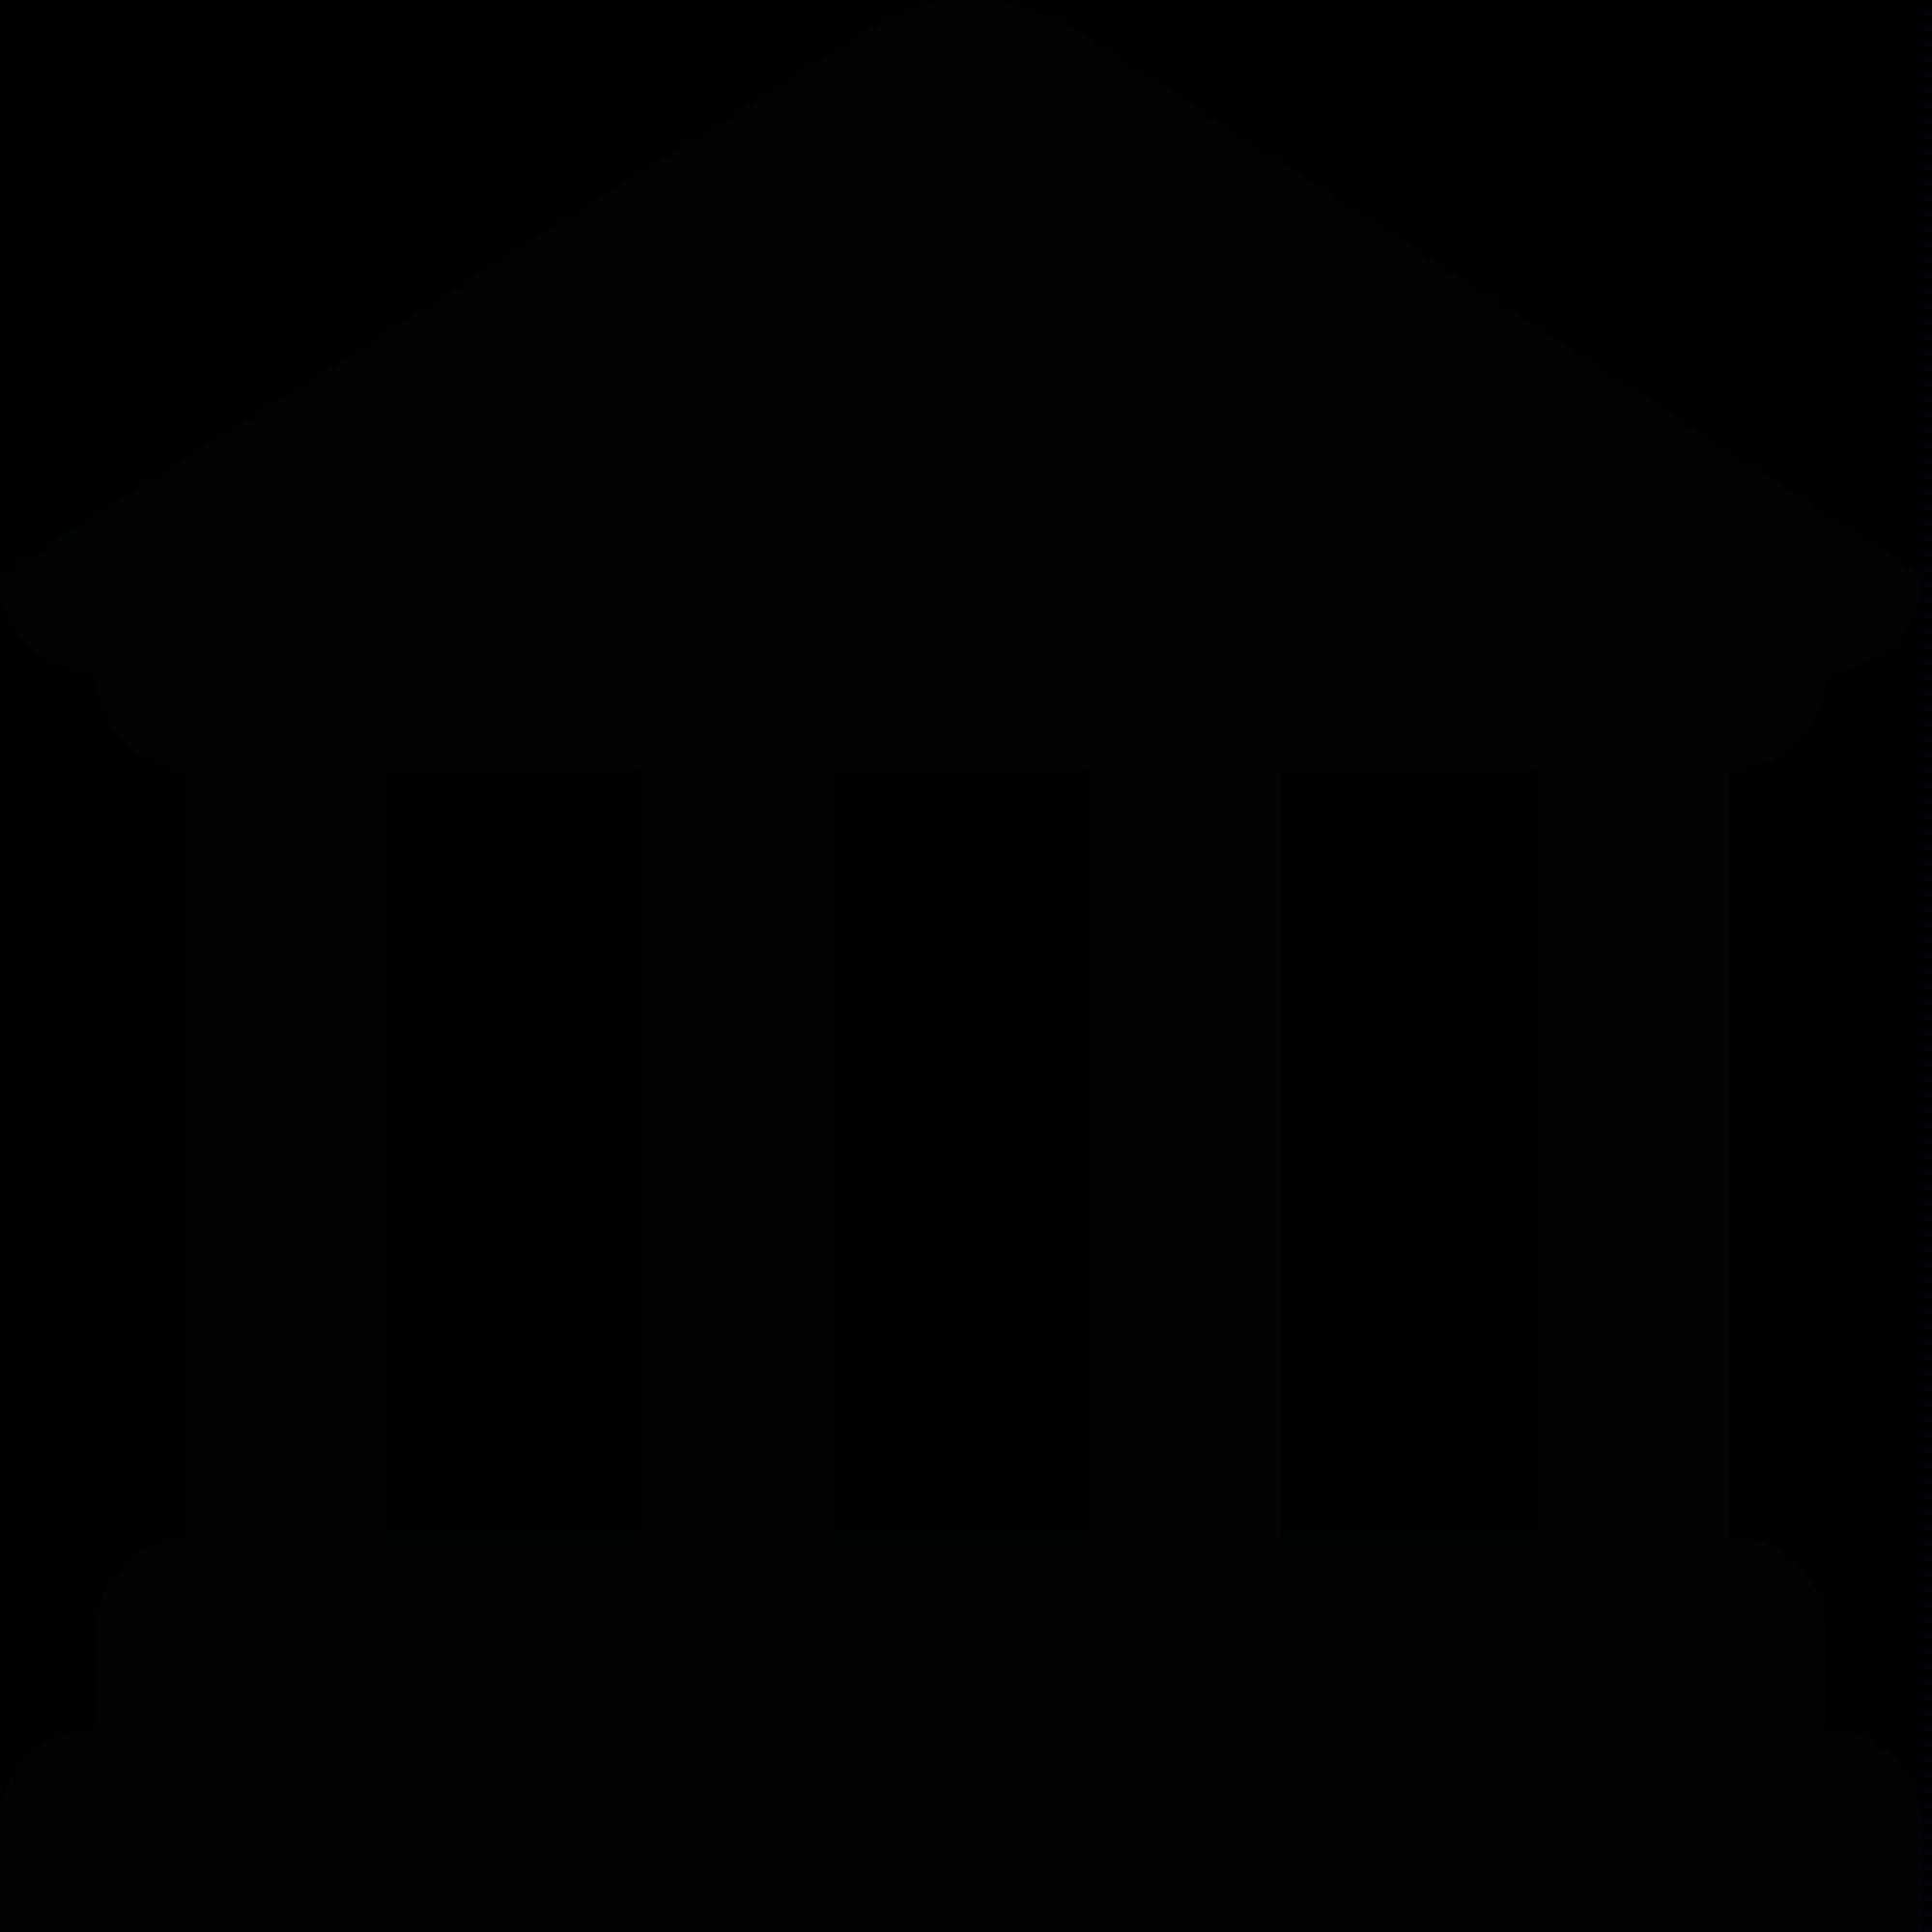 Procura barcelona provincial council. Courthouse clipart municipality